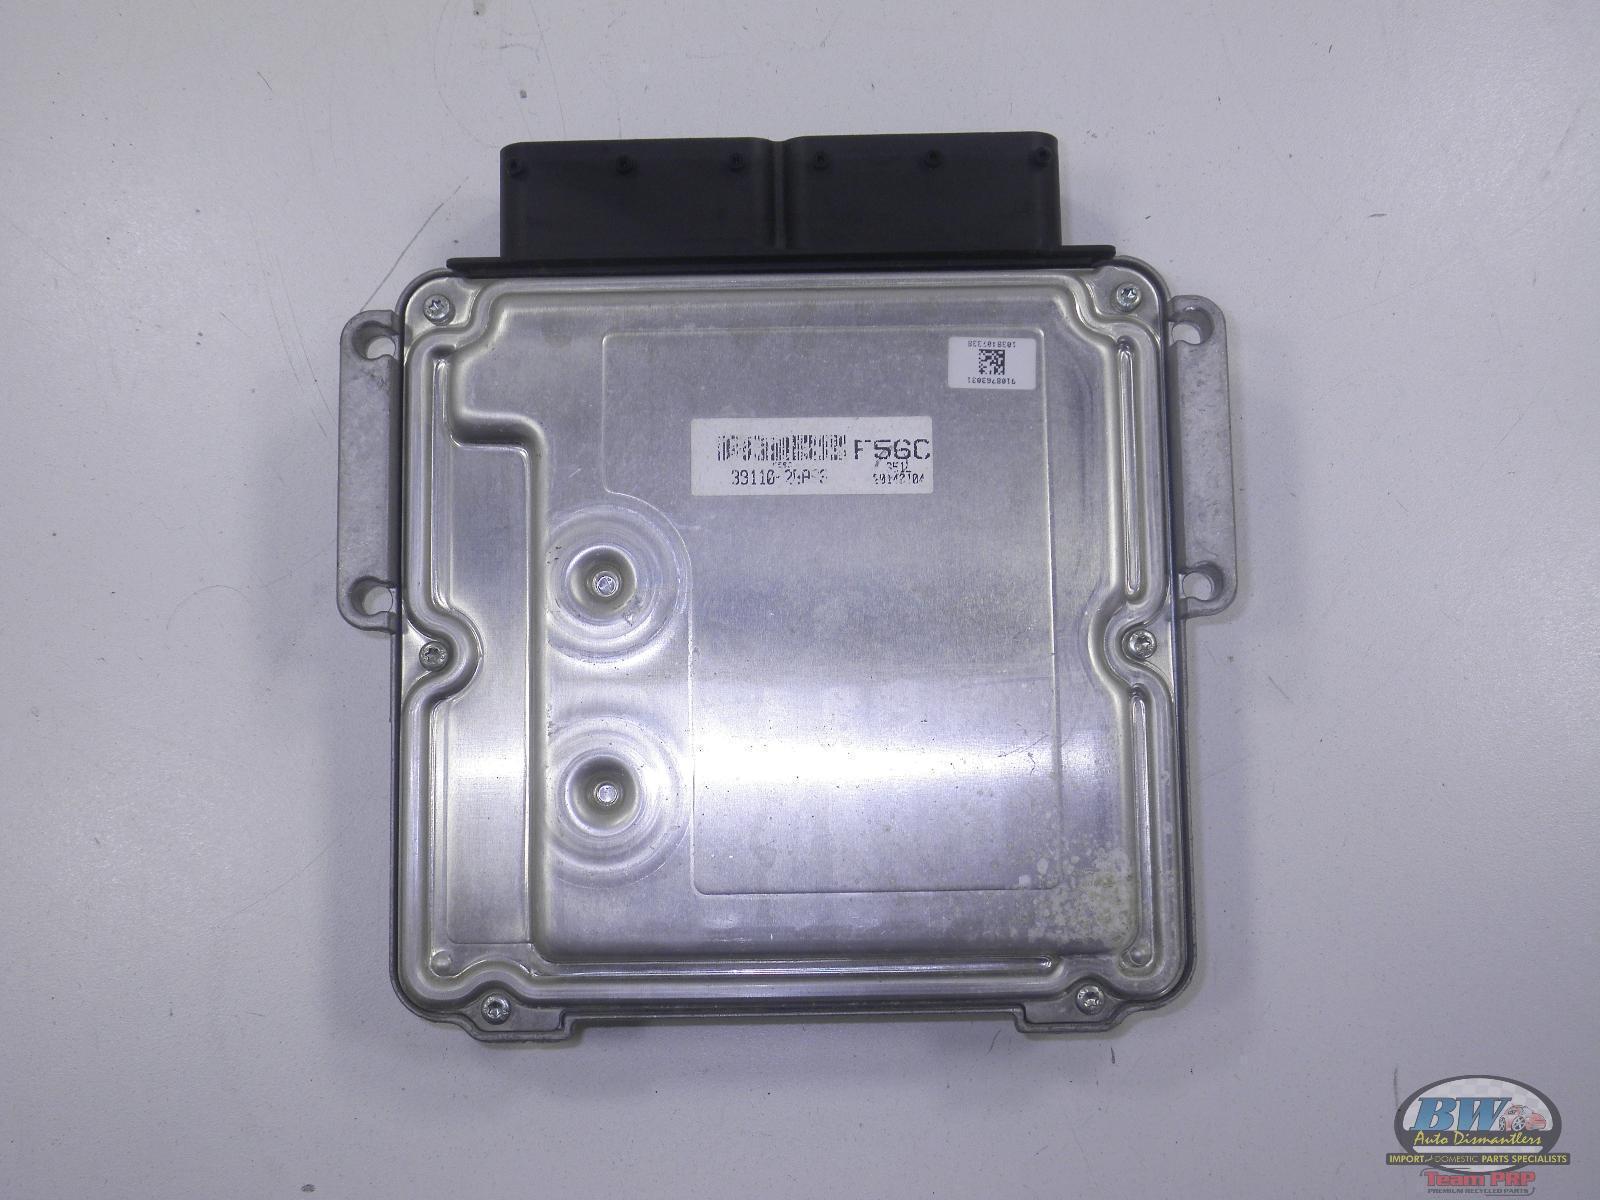 2014 Hyundai Accent Computer Brain Engine Control ECU ECM EBX Module 39110-2BAS9